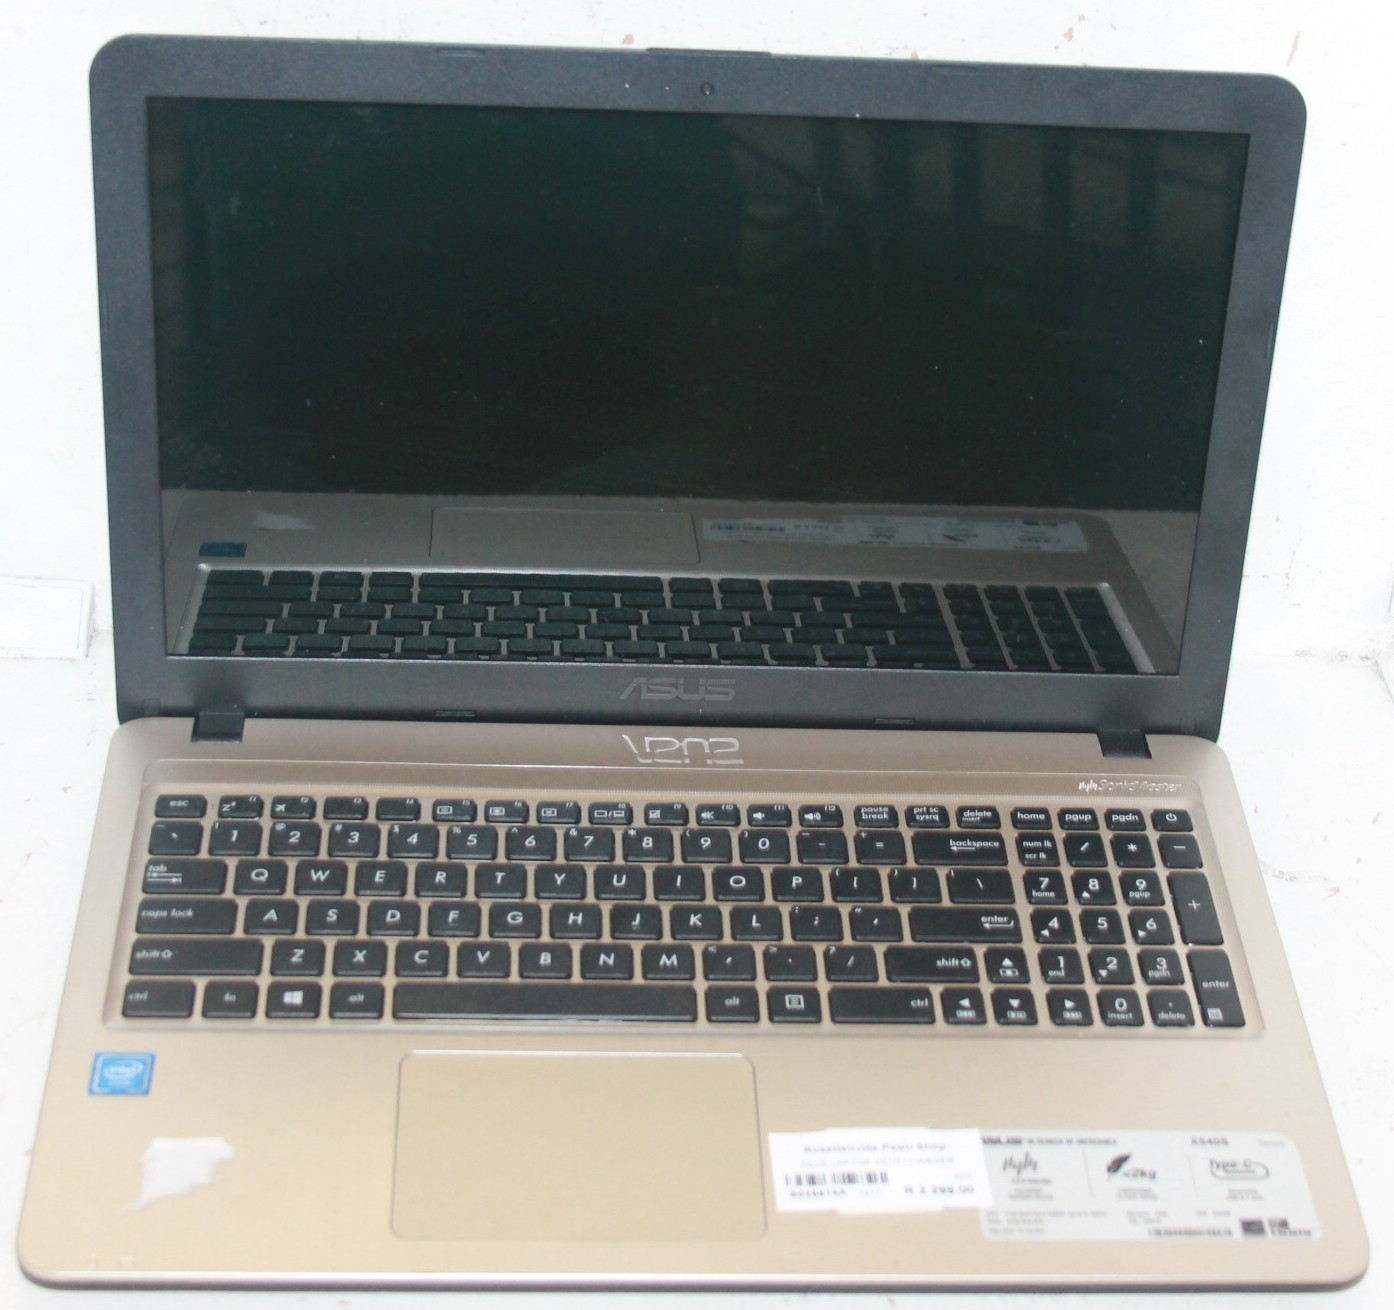 Asus laptop S026814A #Rosettenvillepawnshop